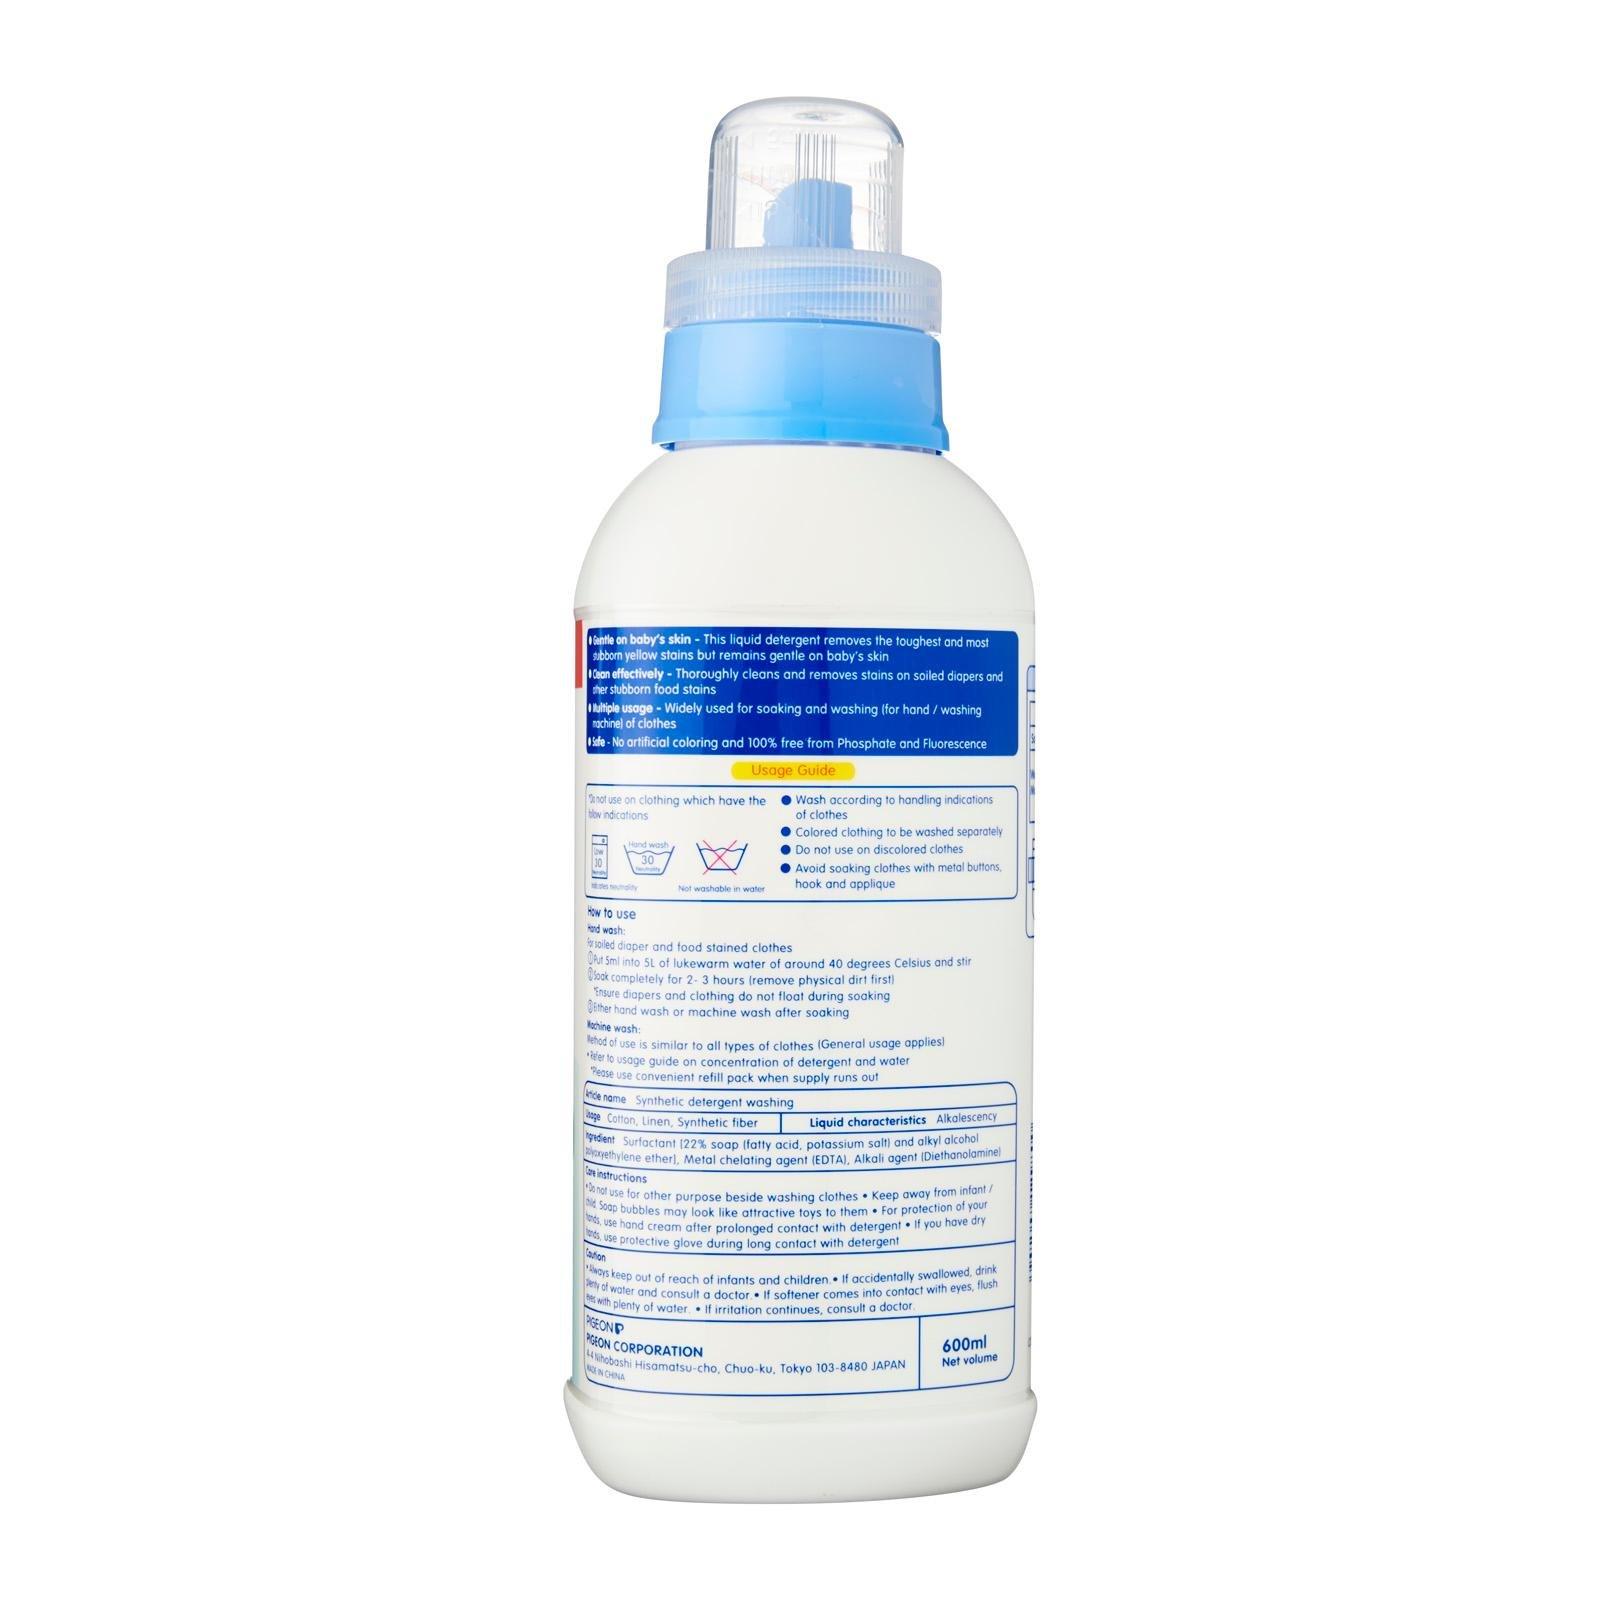 Pigeon laundry detergent (liquid) - 600ml by Pigeon